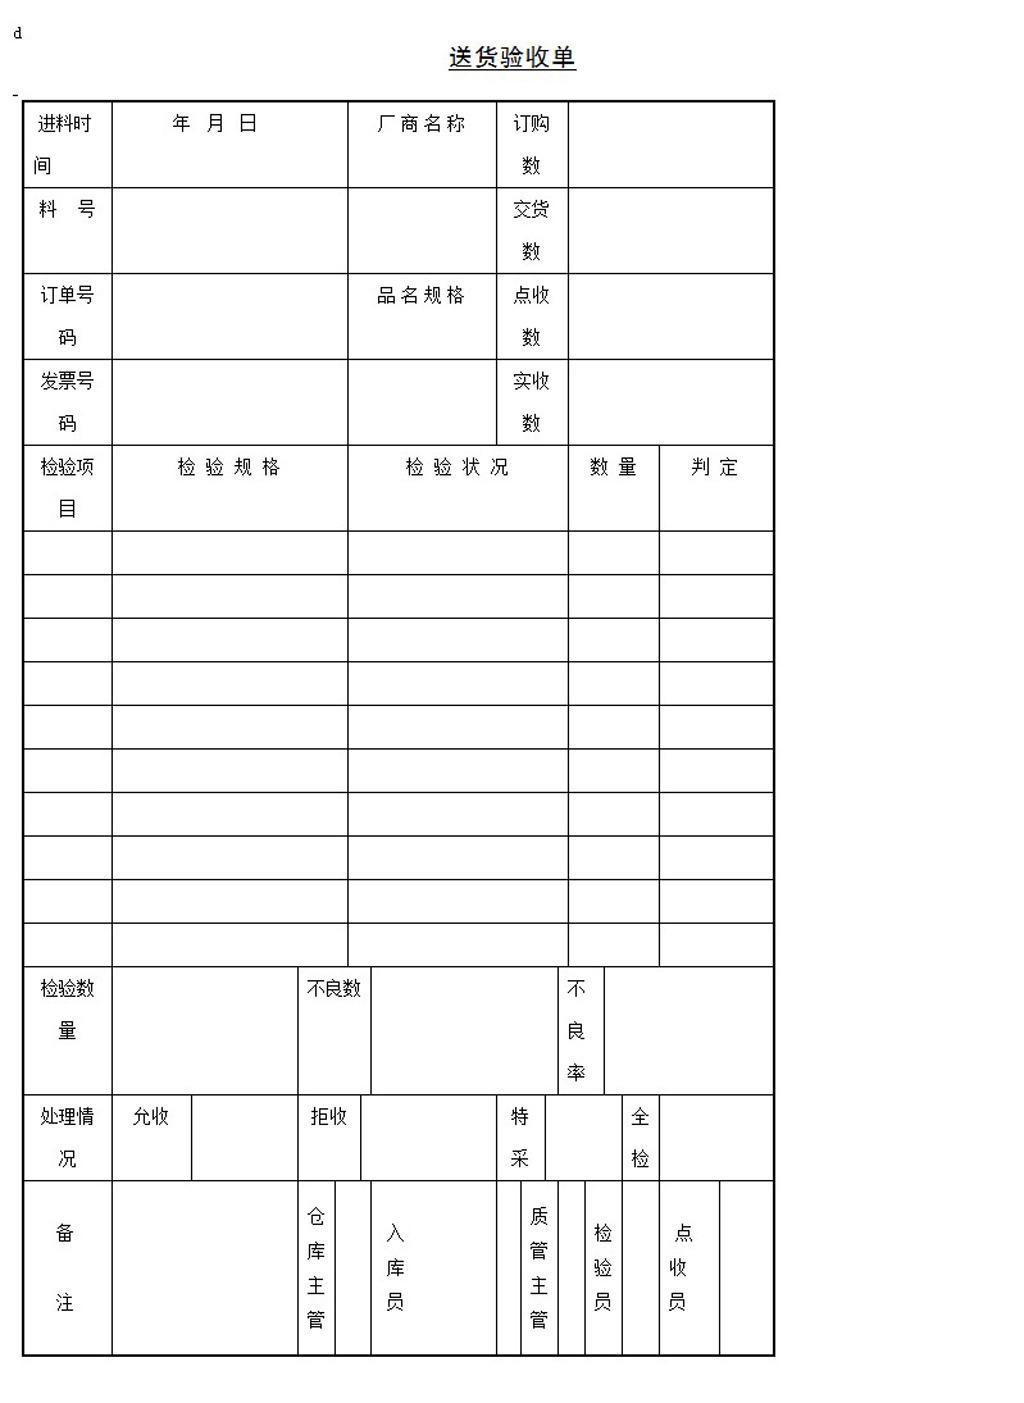 送货验收单word模板下载图片下载 送货验收单word模板下载 word表格